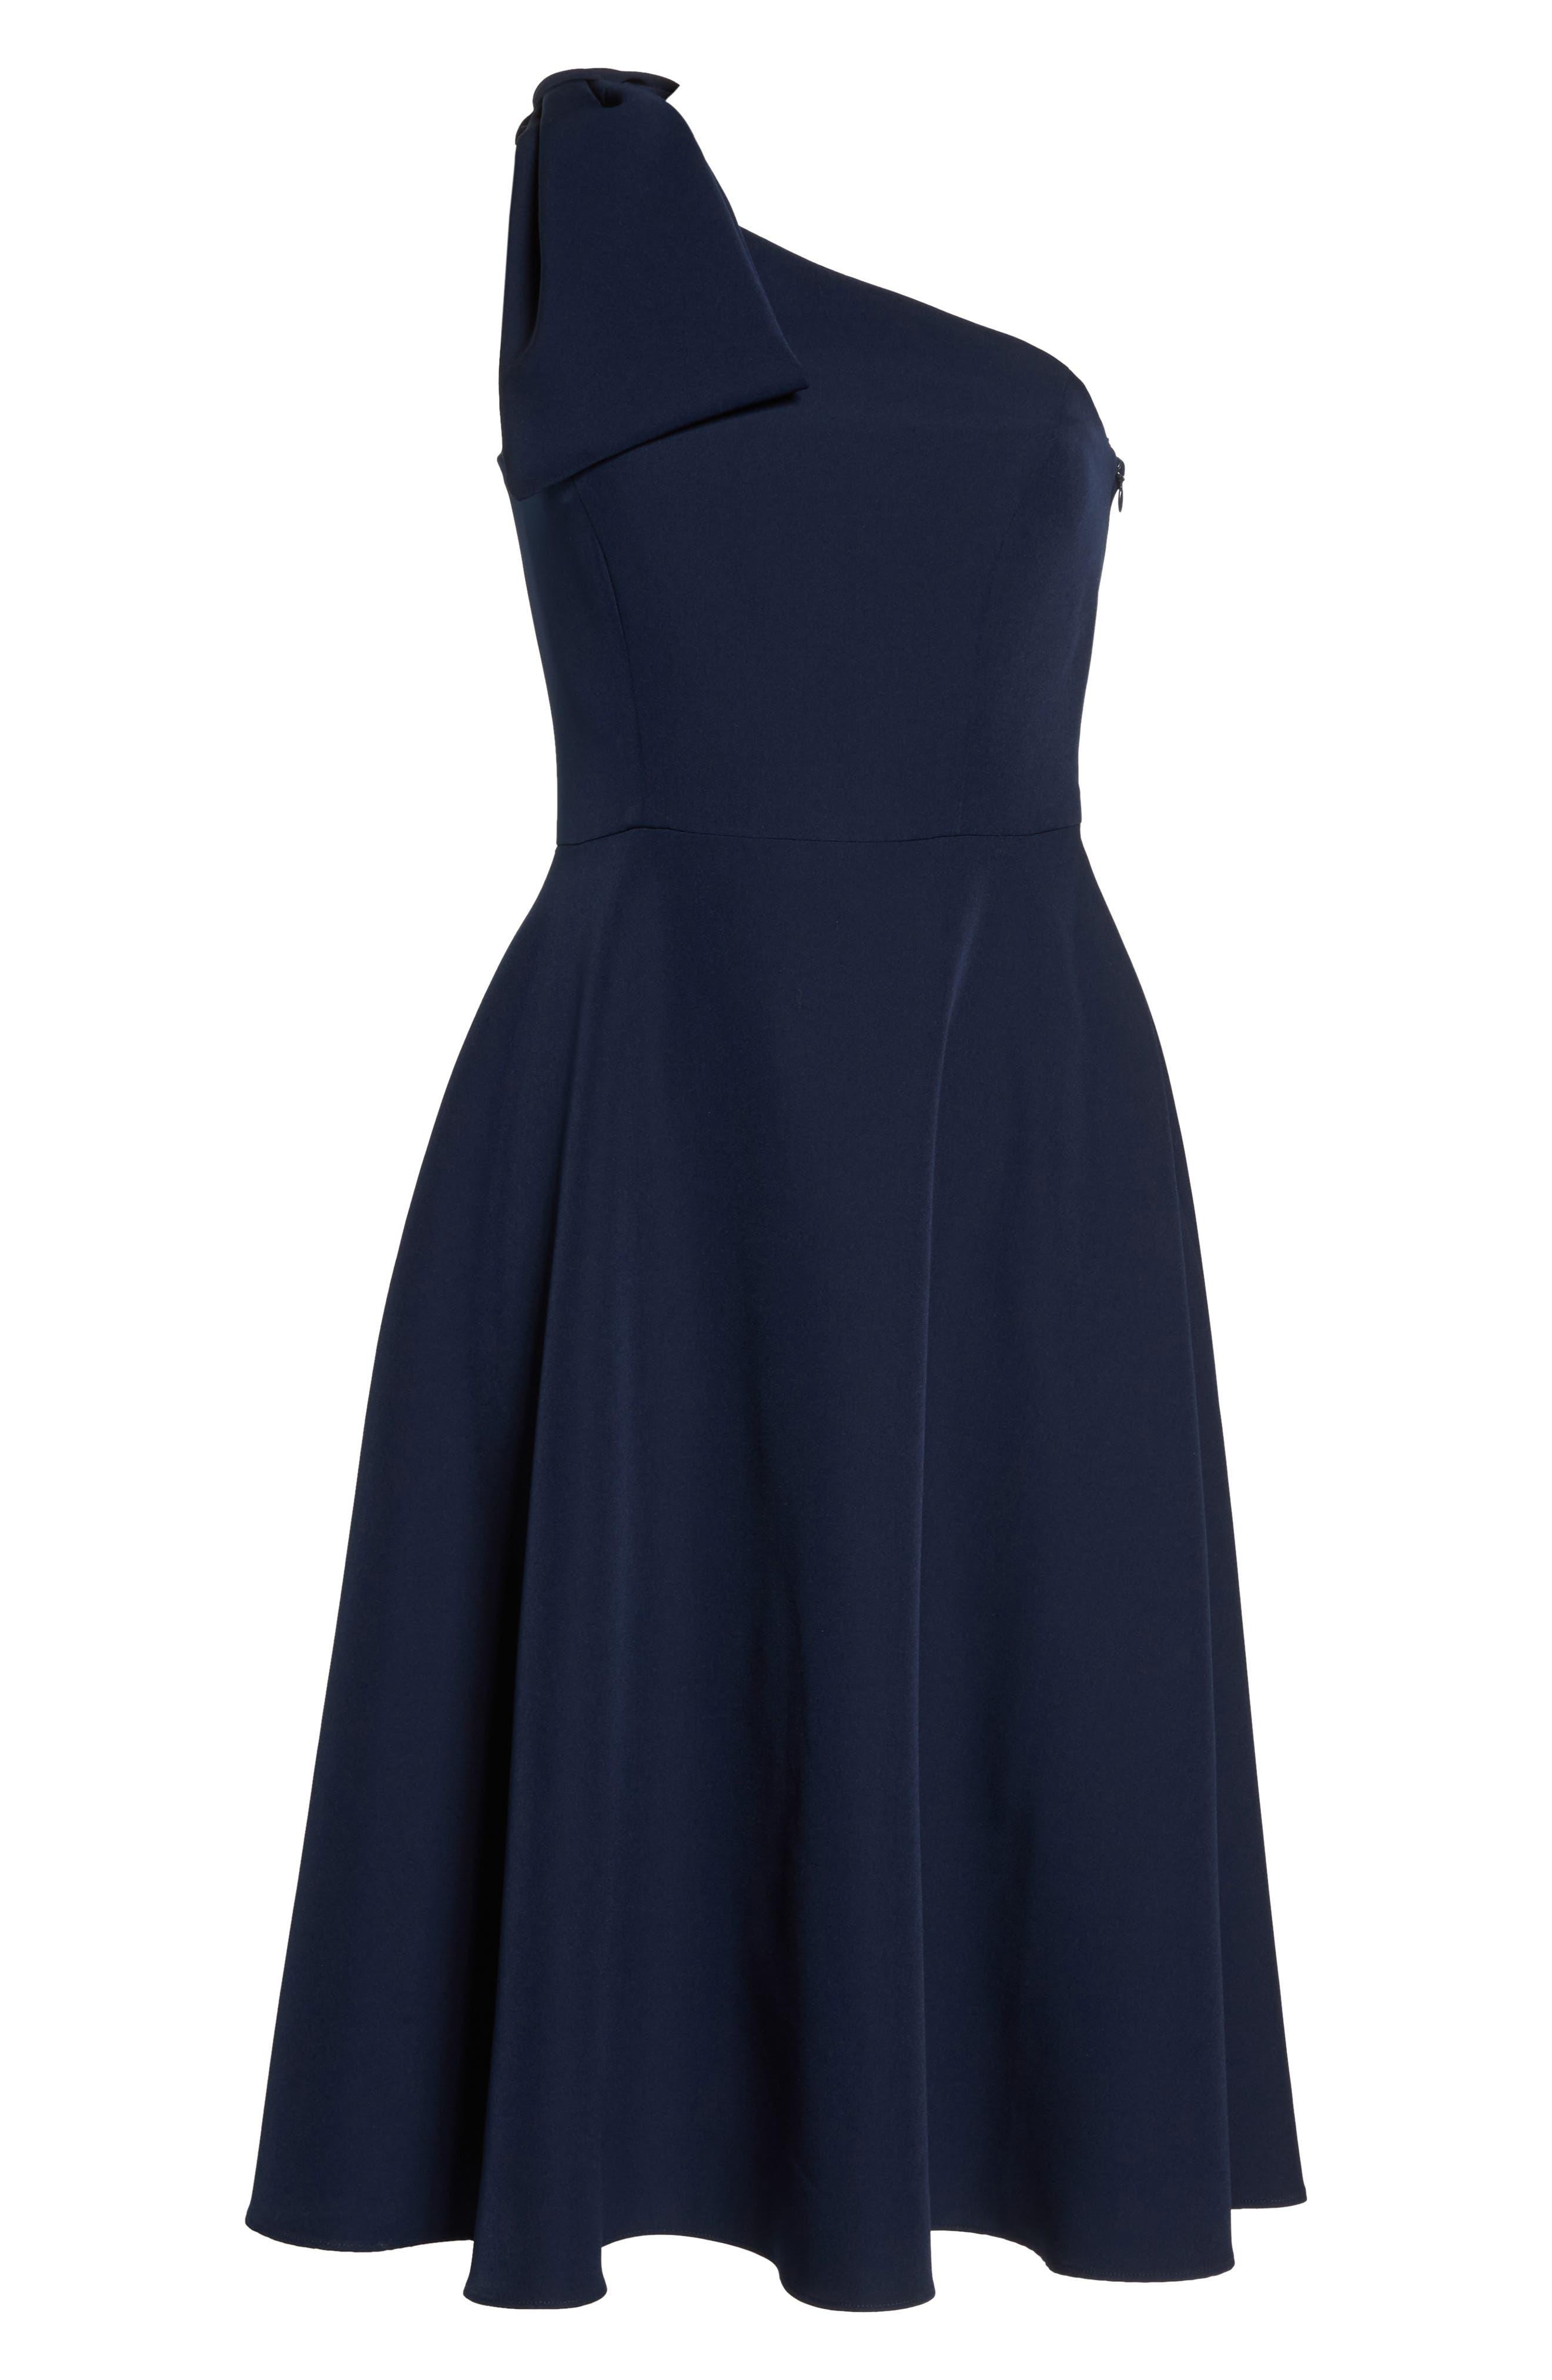 Yvonne Dream Crepe One-Shoulder Dress,                             Alternate thumbnail 8, color,                             Navy